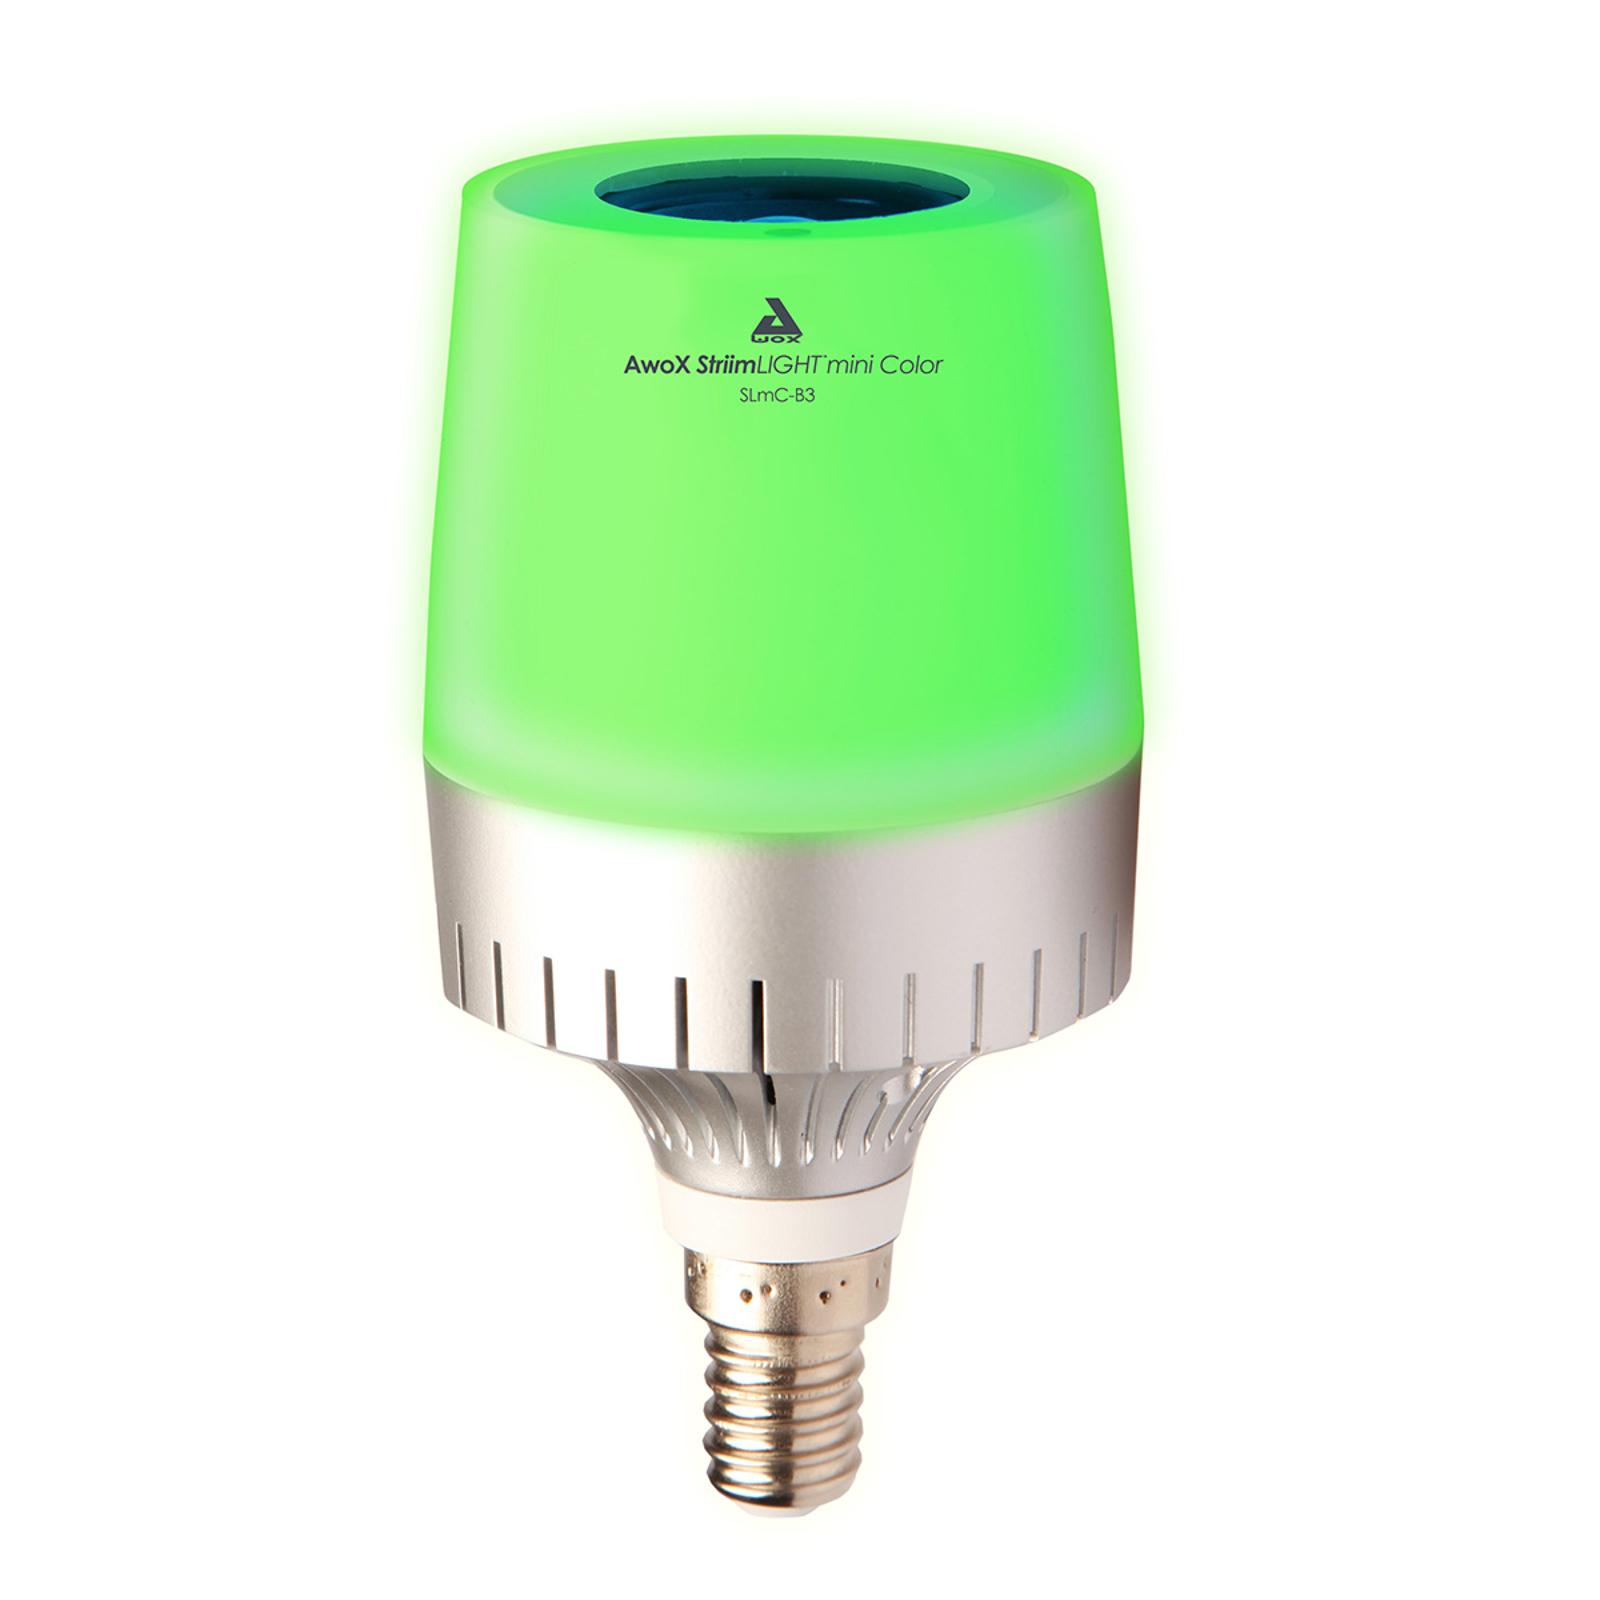 AwoX StriimLIGHT mini LED Lampe